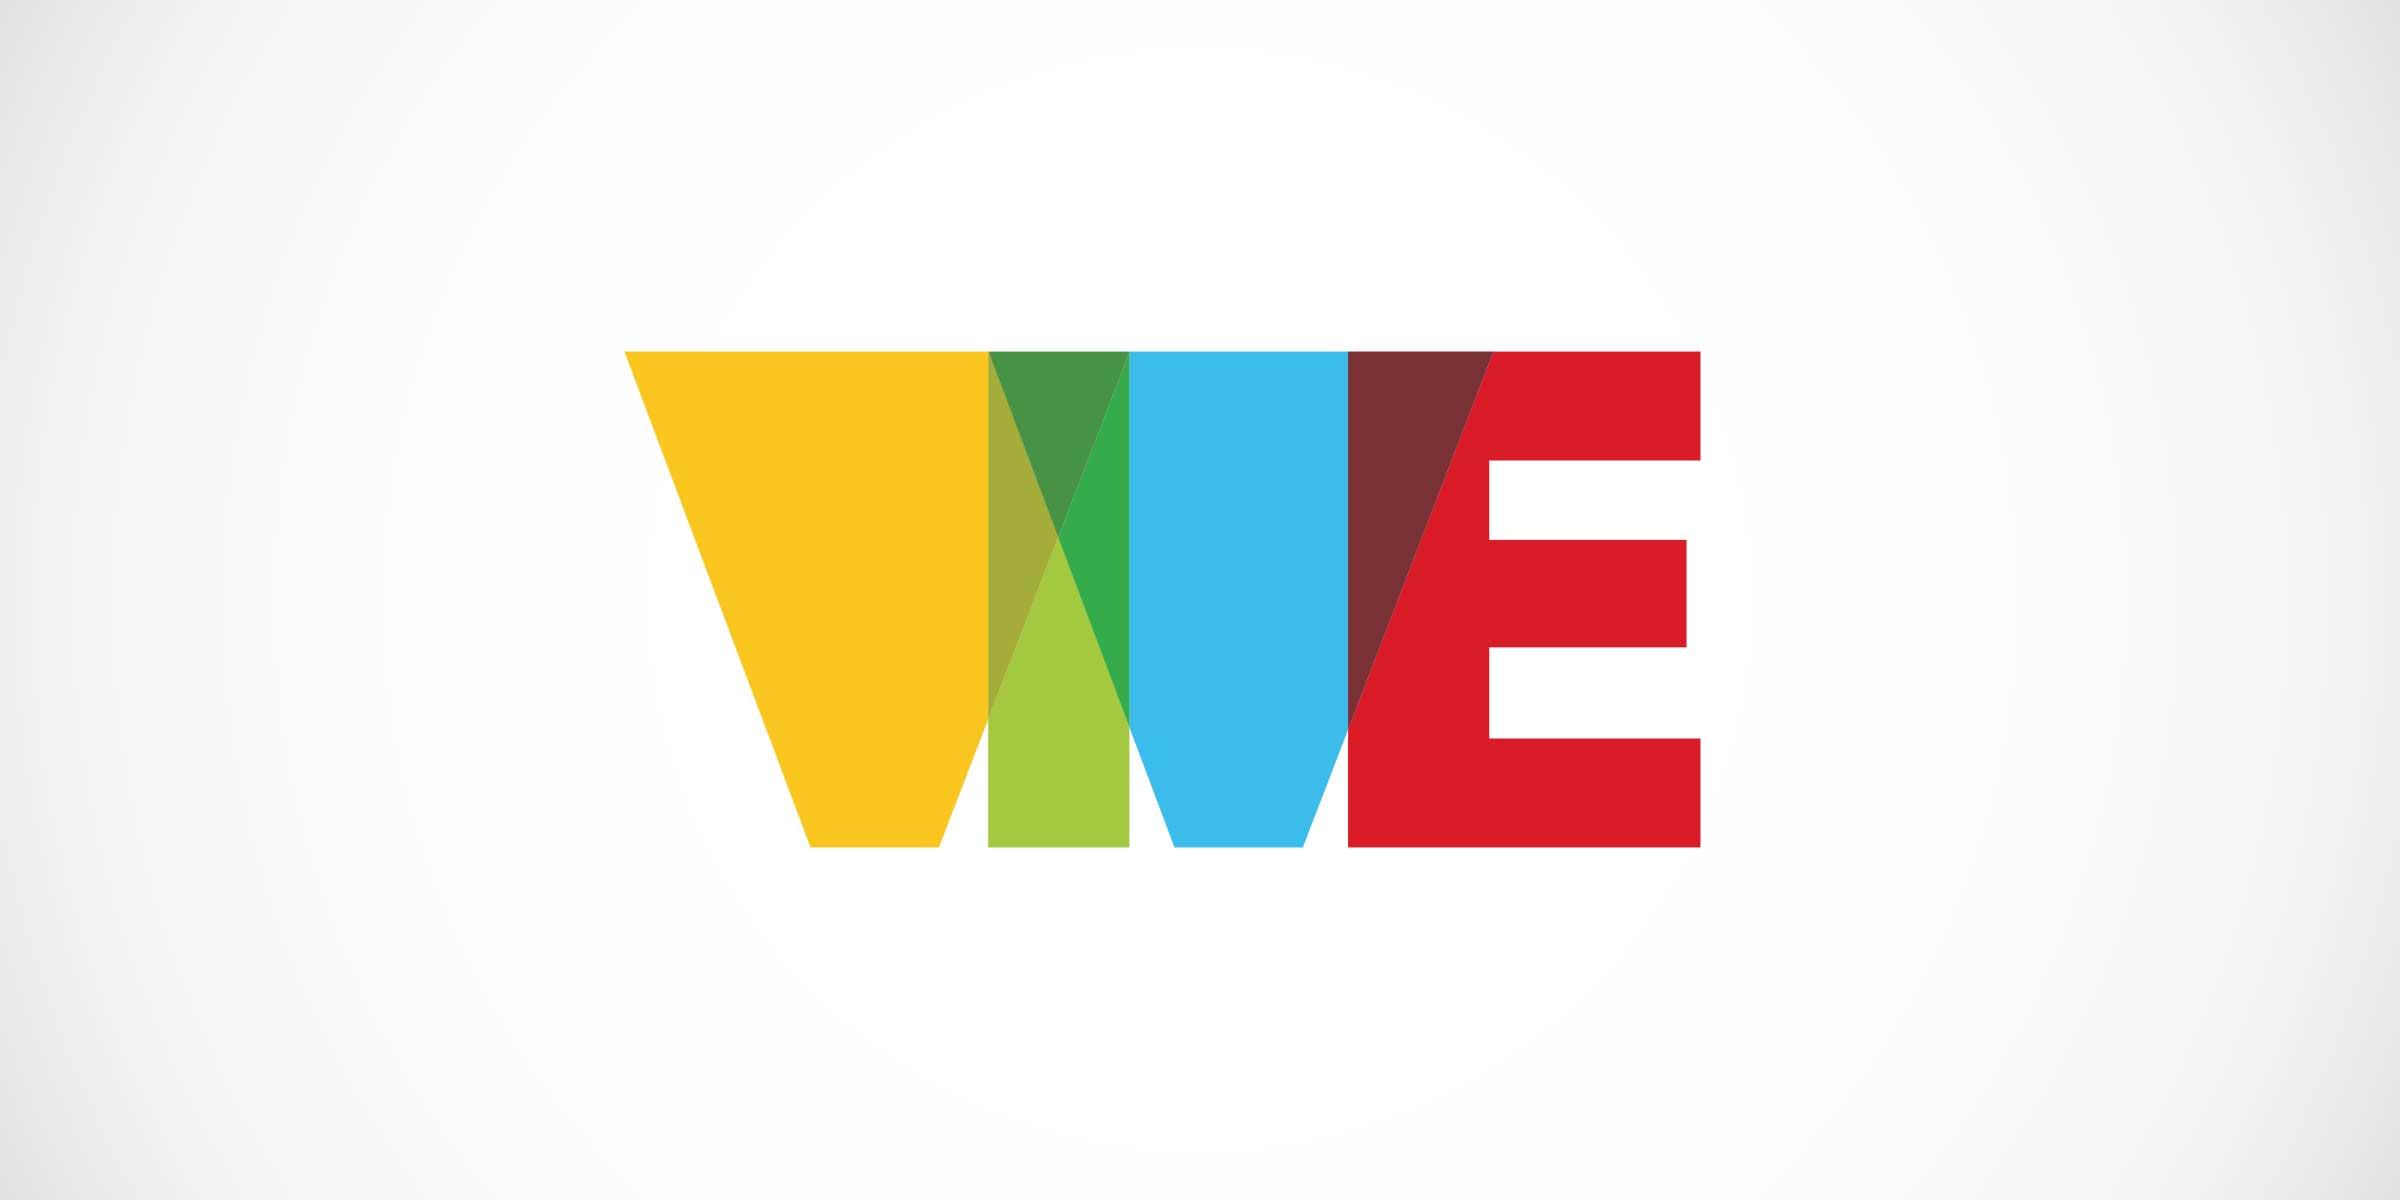 36pt - Vive Dekalb